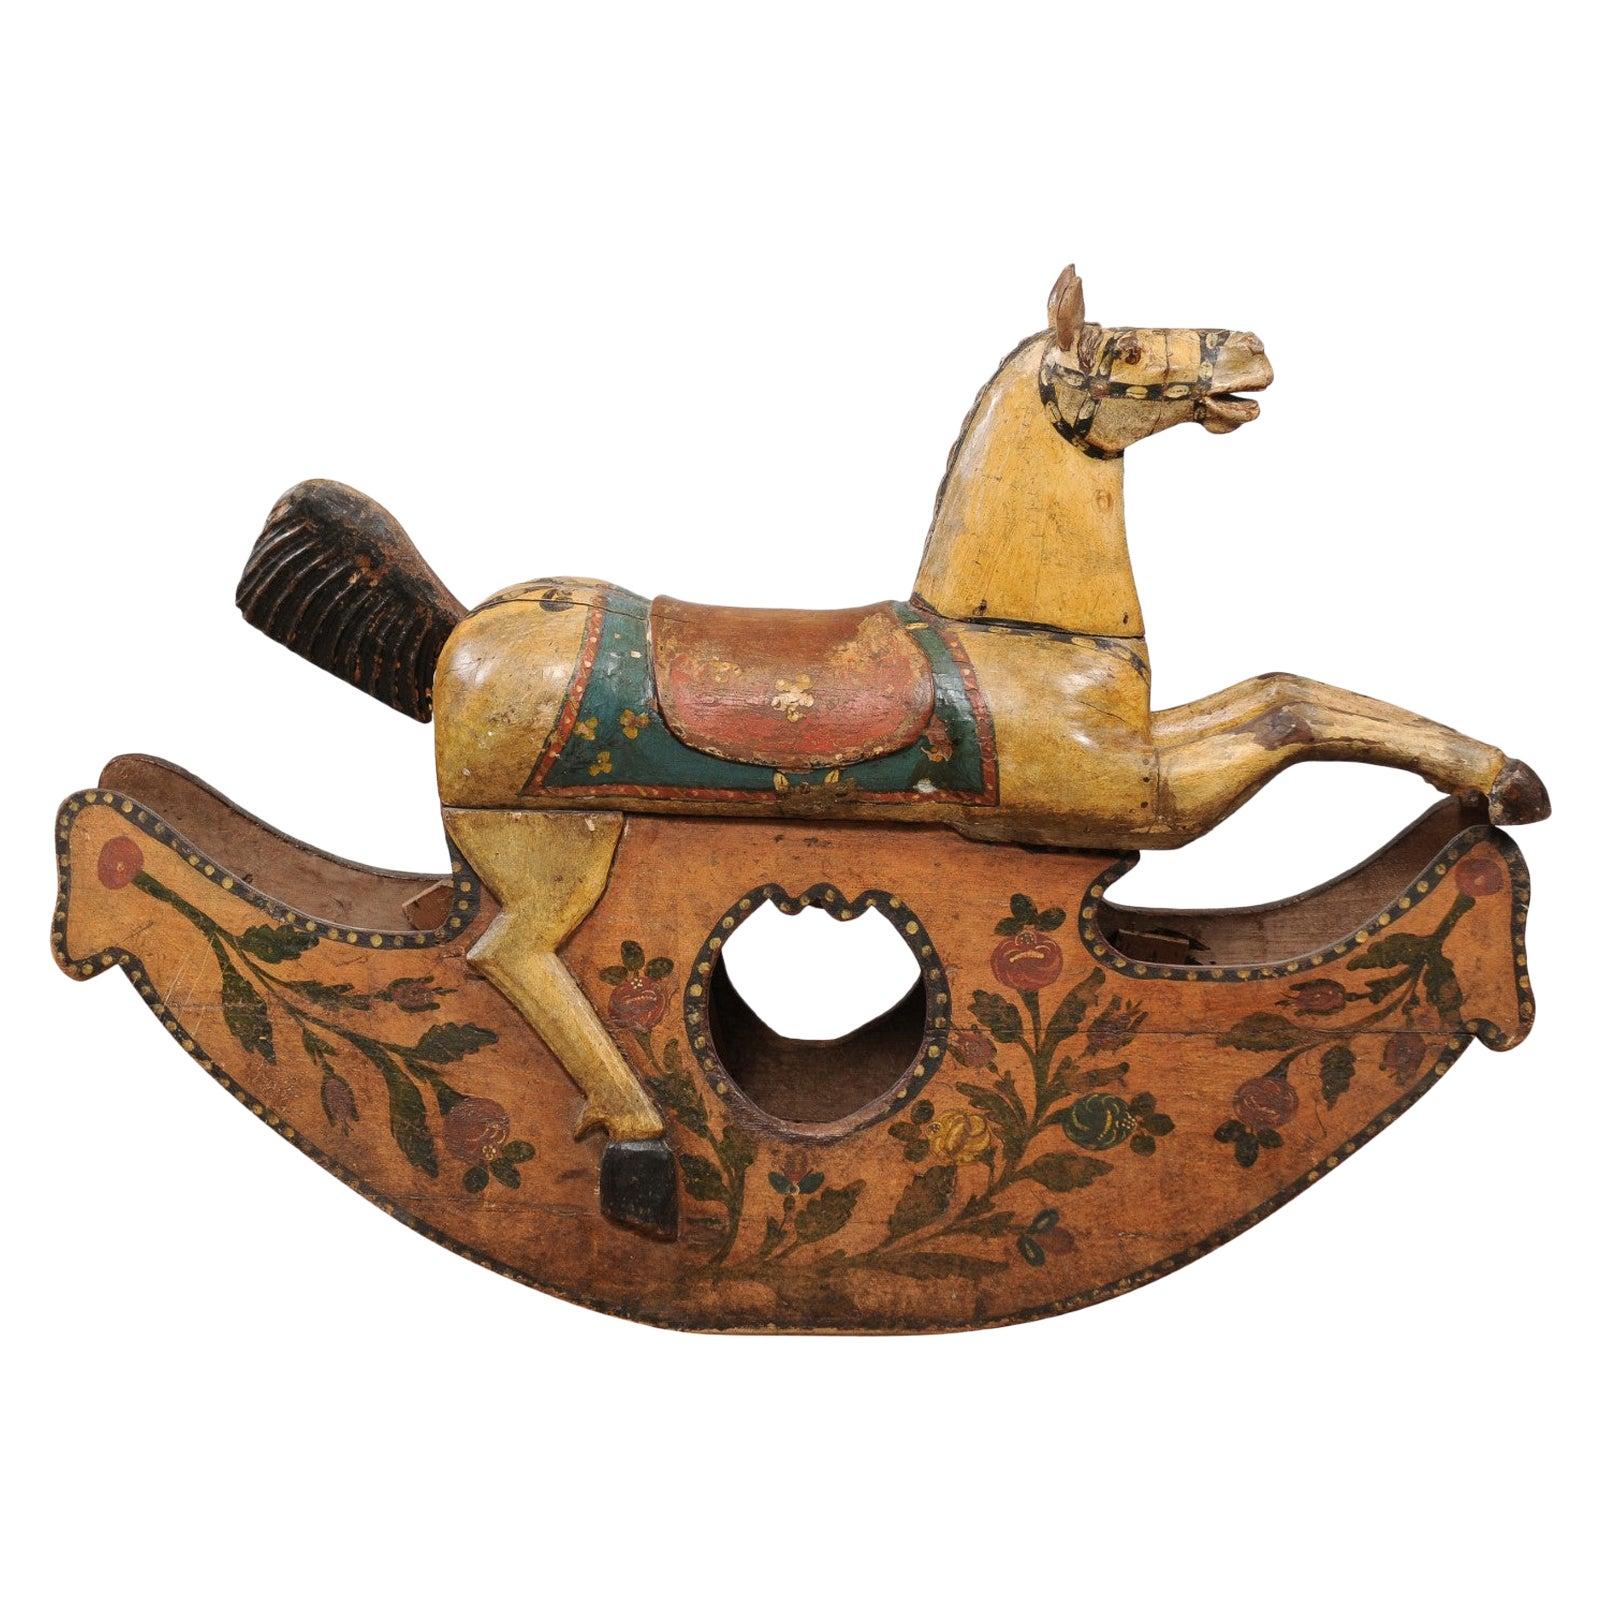 19th Century Italian Painted Wood Rocking Horse